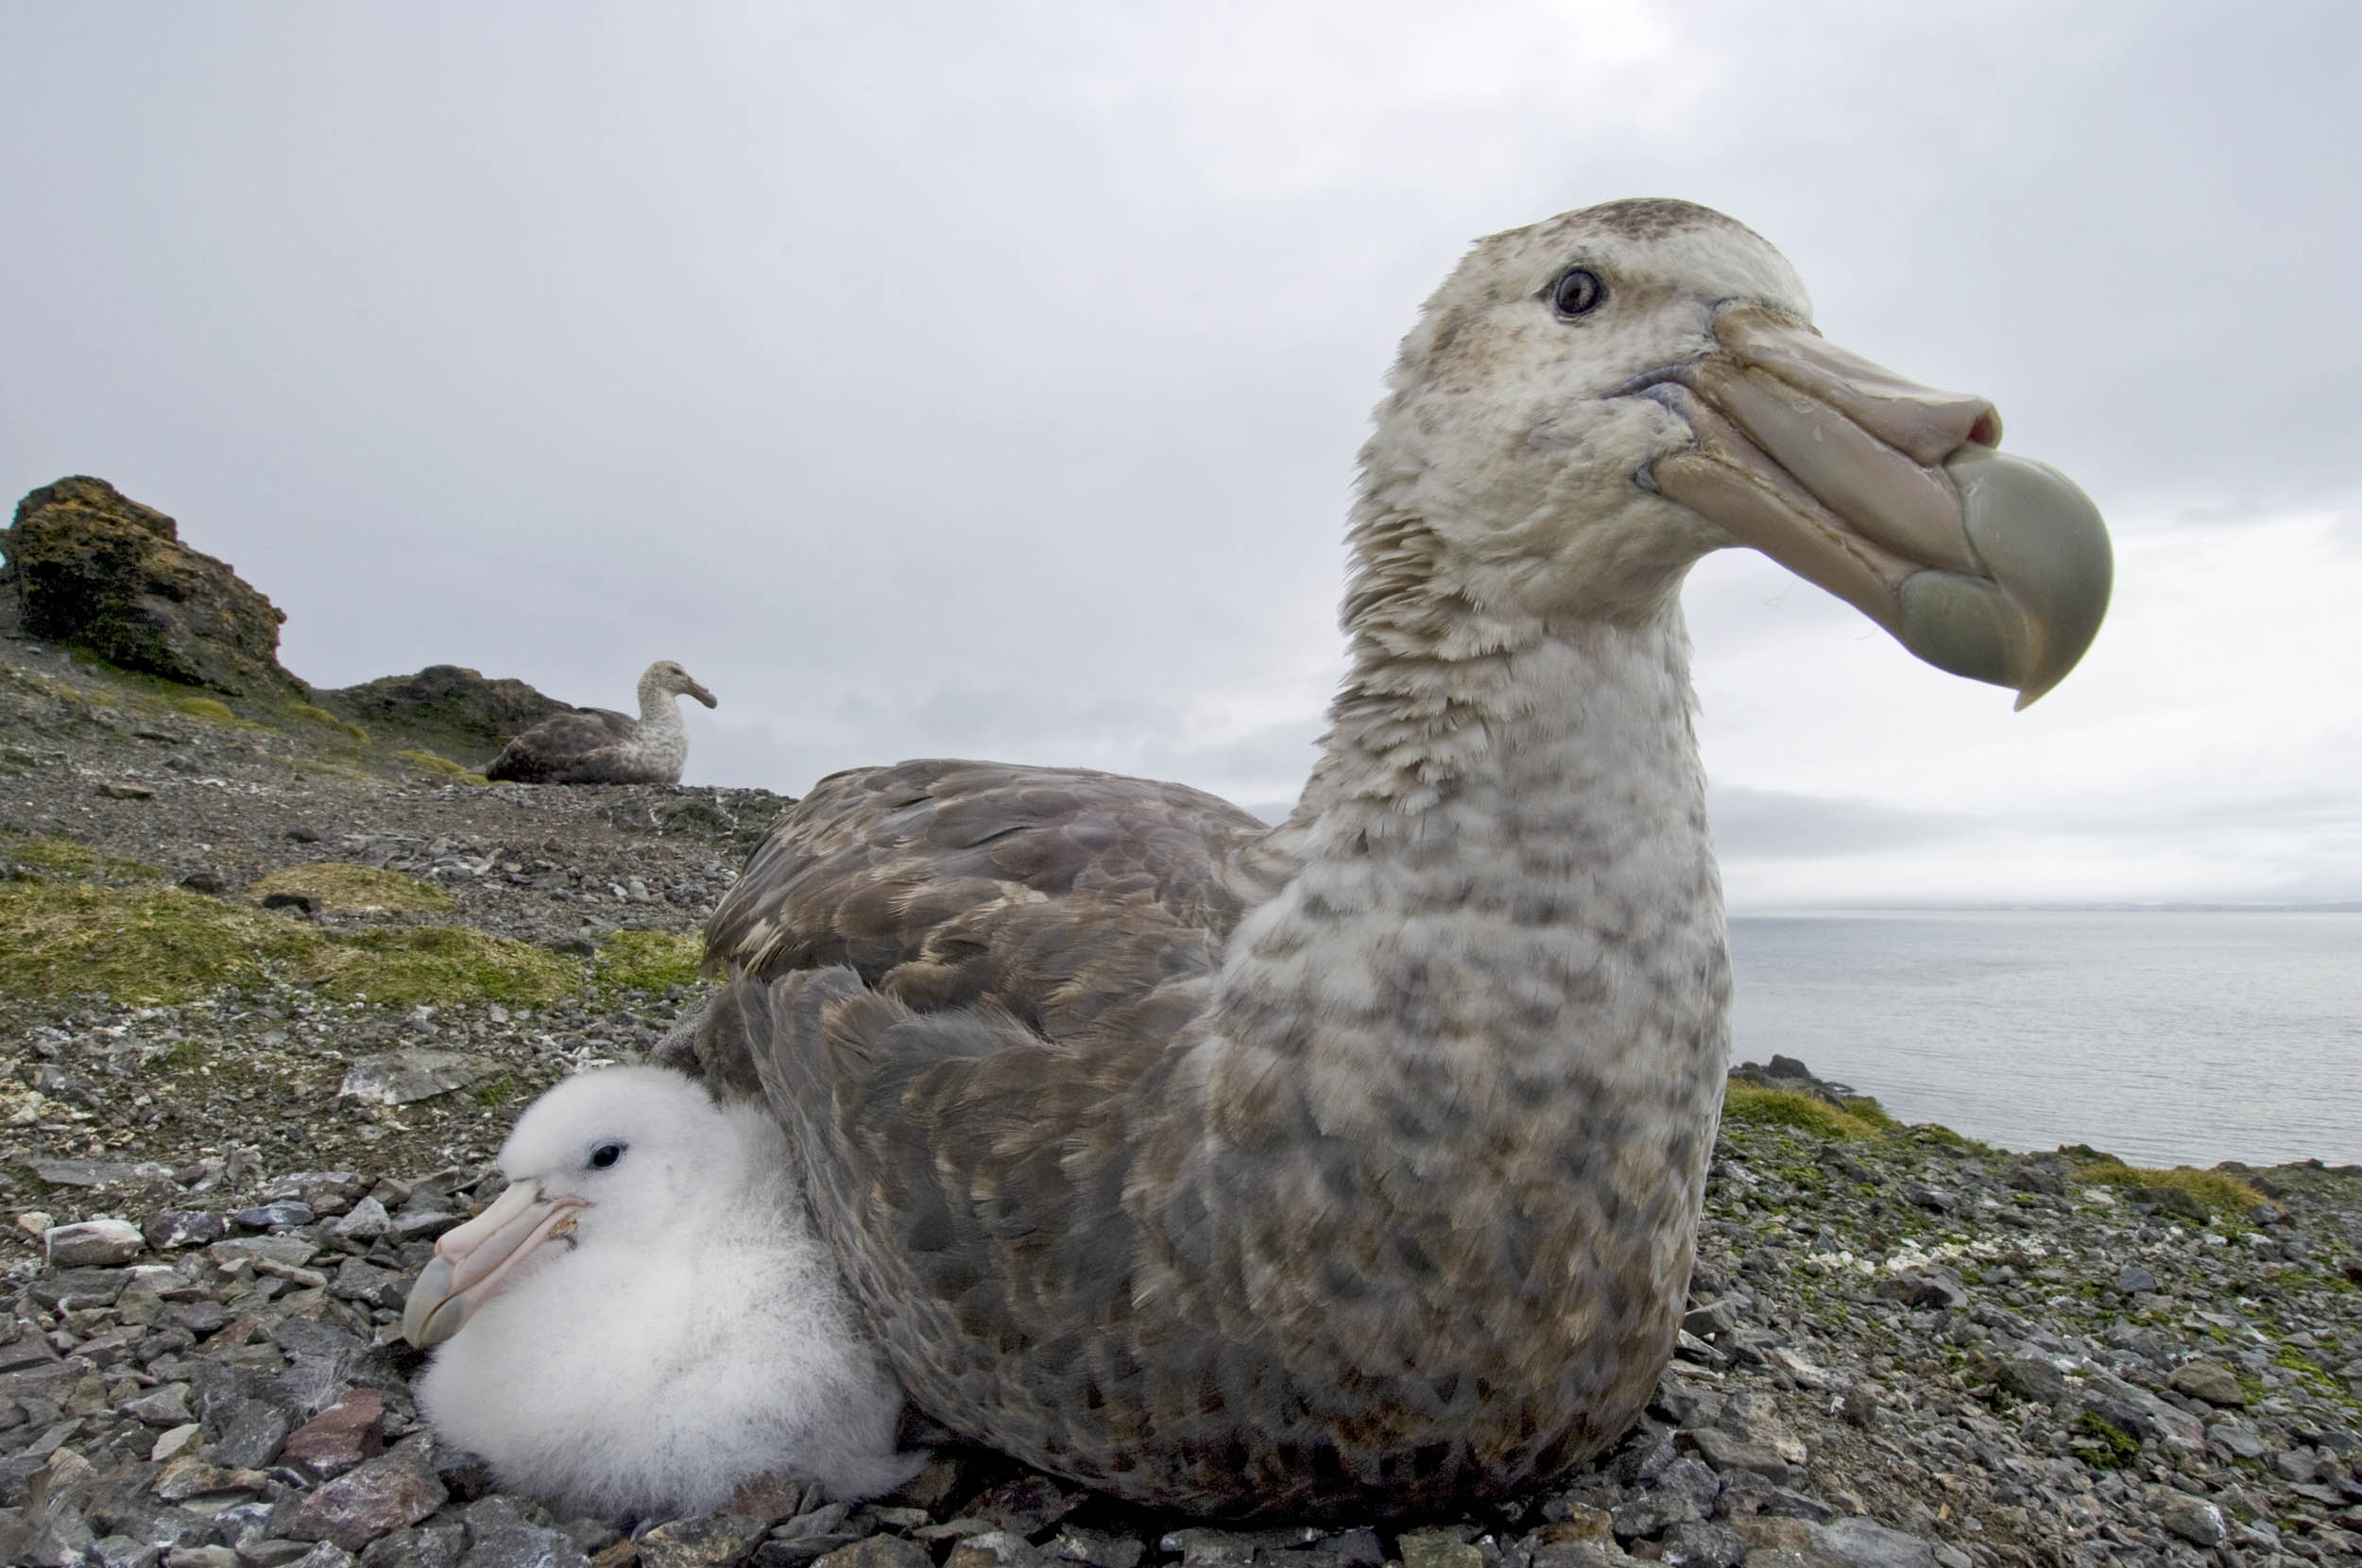 Antártida - Gaia - Hector Garrido, Aerial and human photography